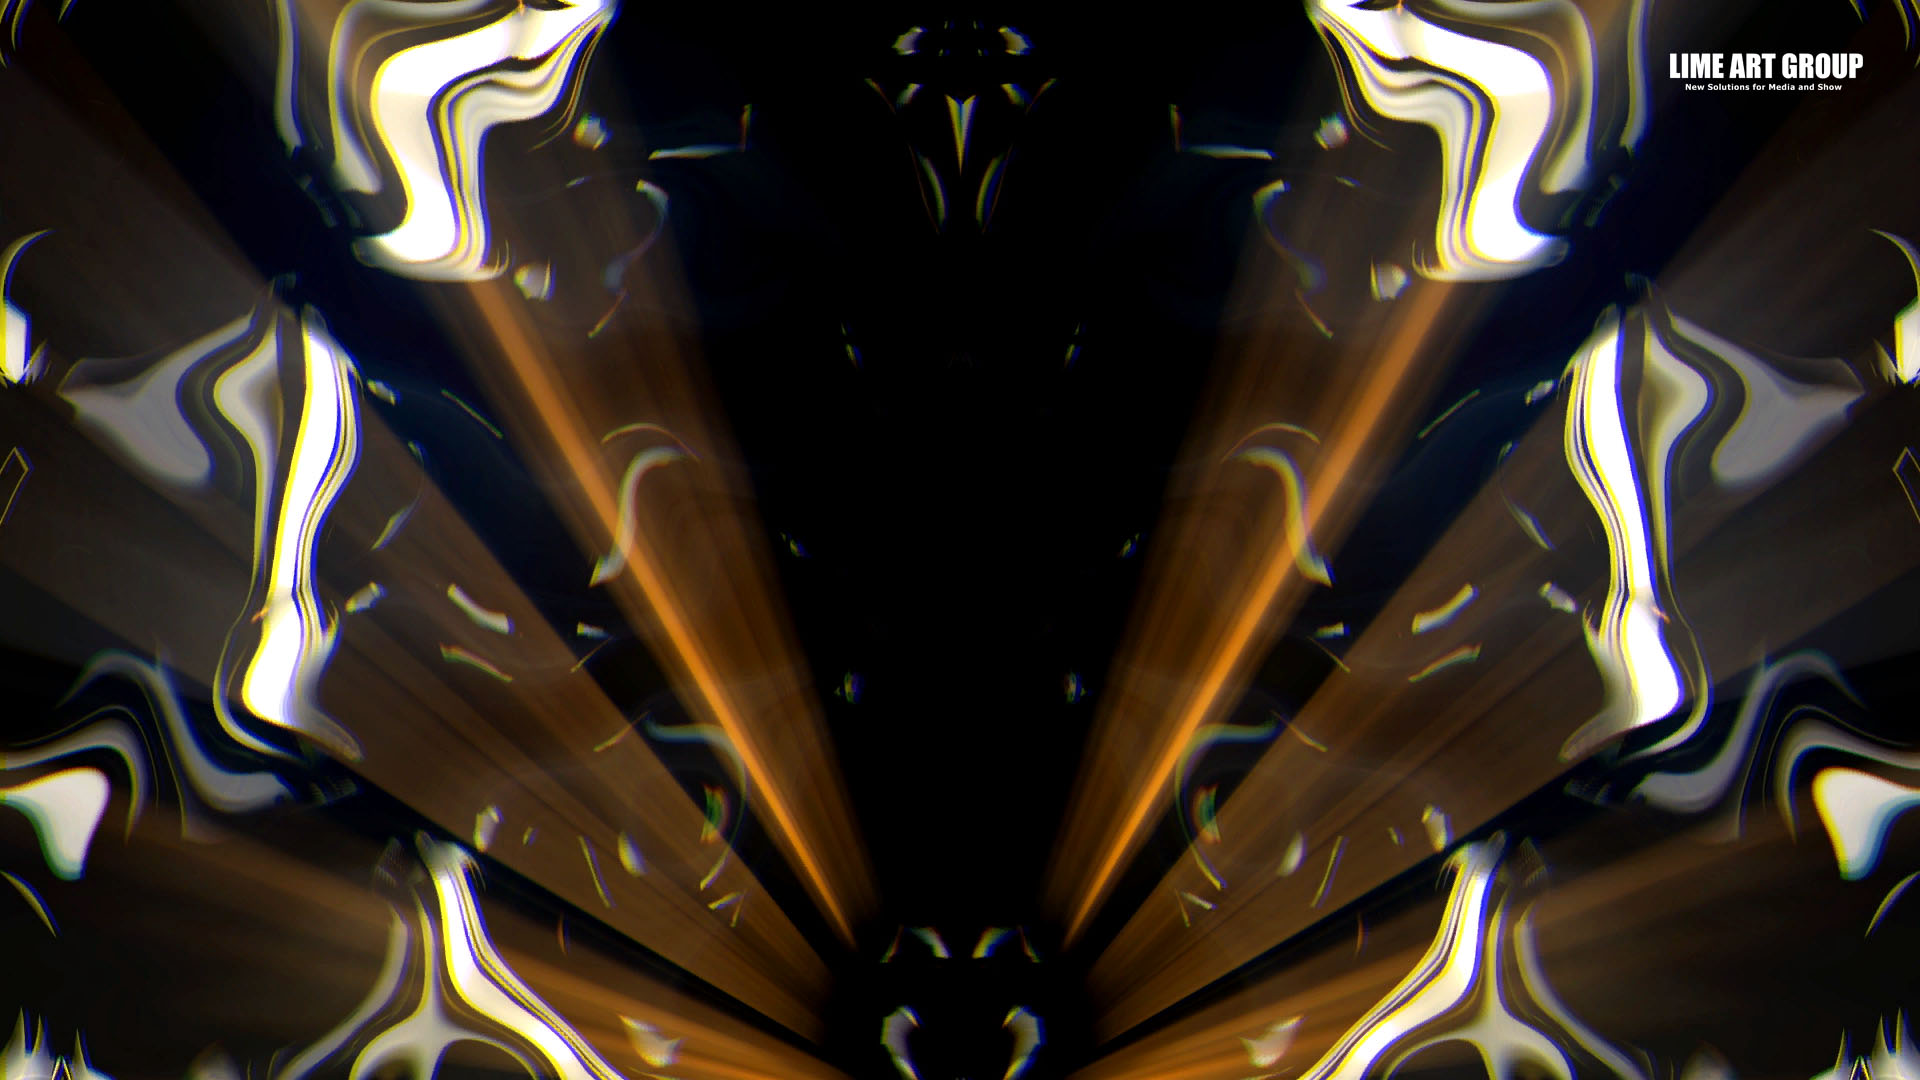 video loops vj loops abstract liquid light 8